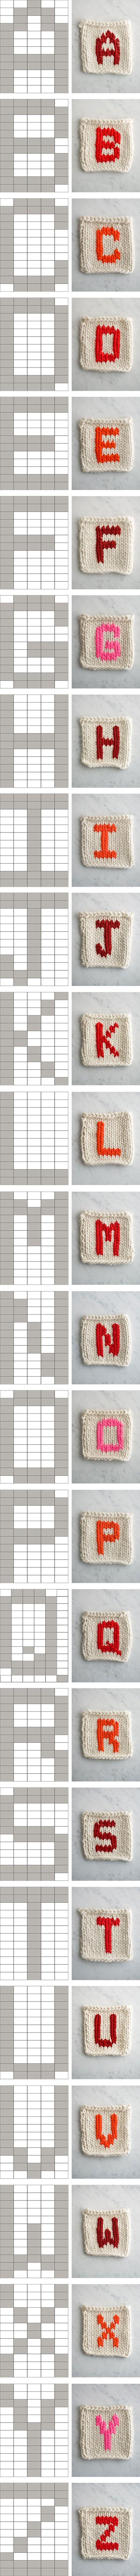 39 best bordado en punto images on Pinterest | Bordado, Tejidos de ...